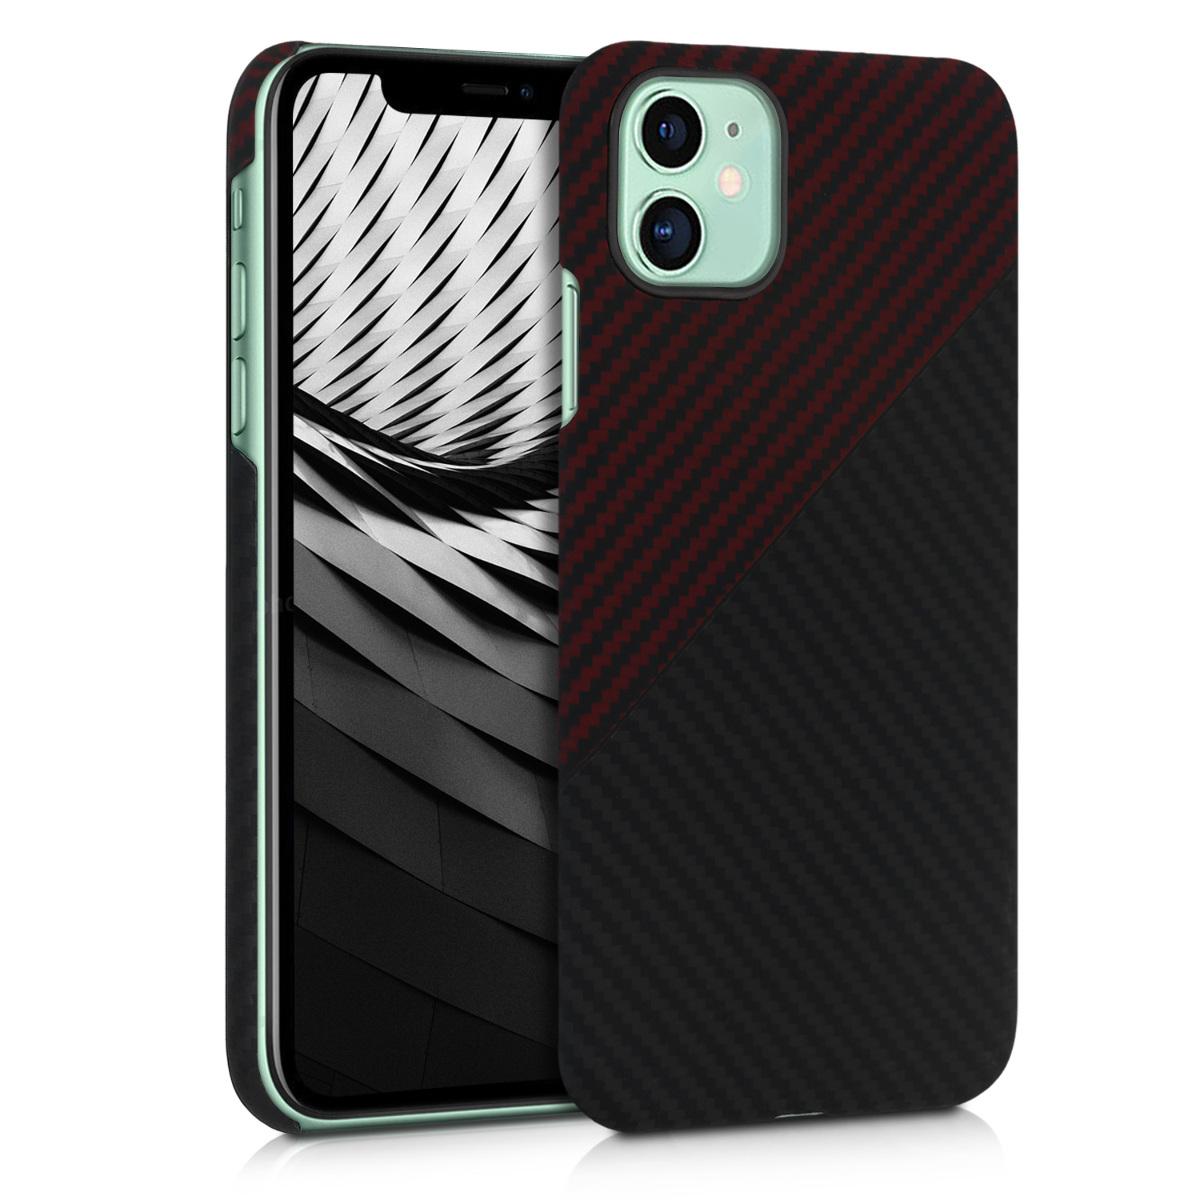 Aramidpouzdro pro Apple iPhone 11 - Red Matte | Black Matte